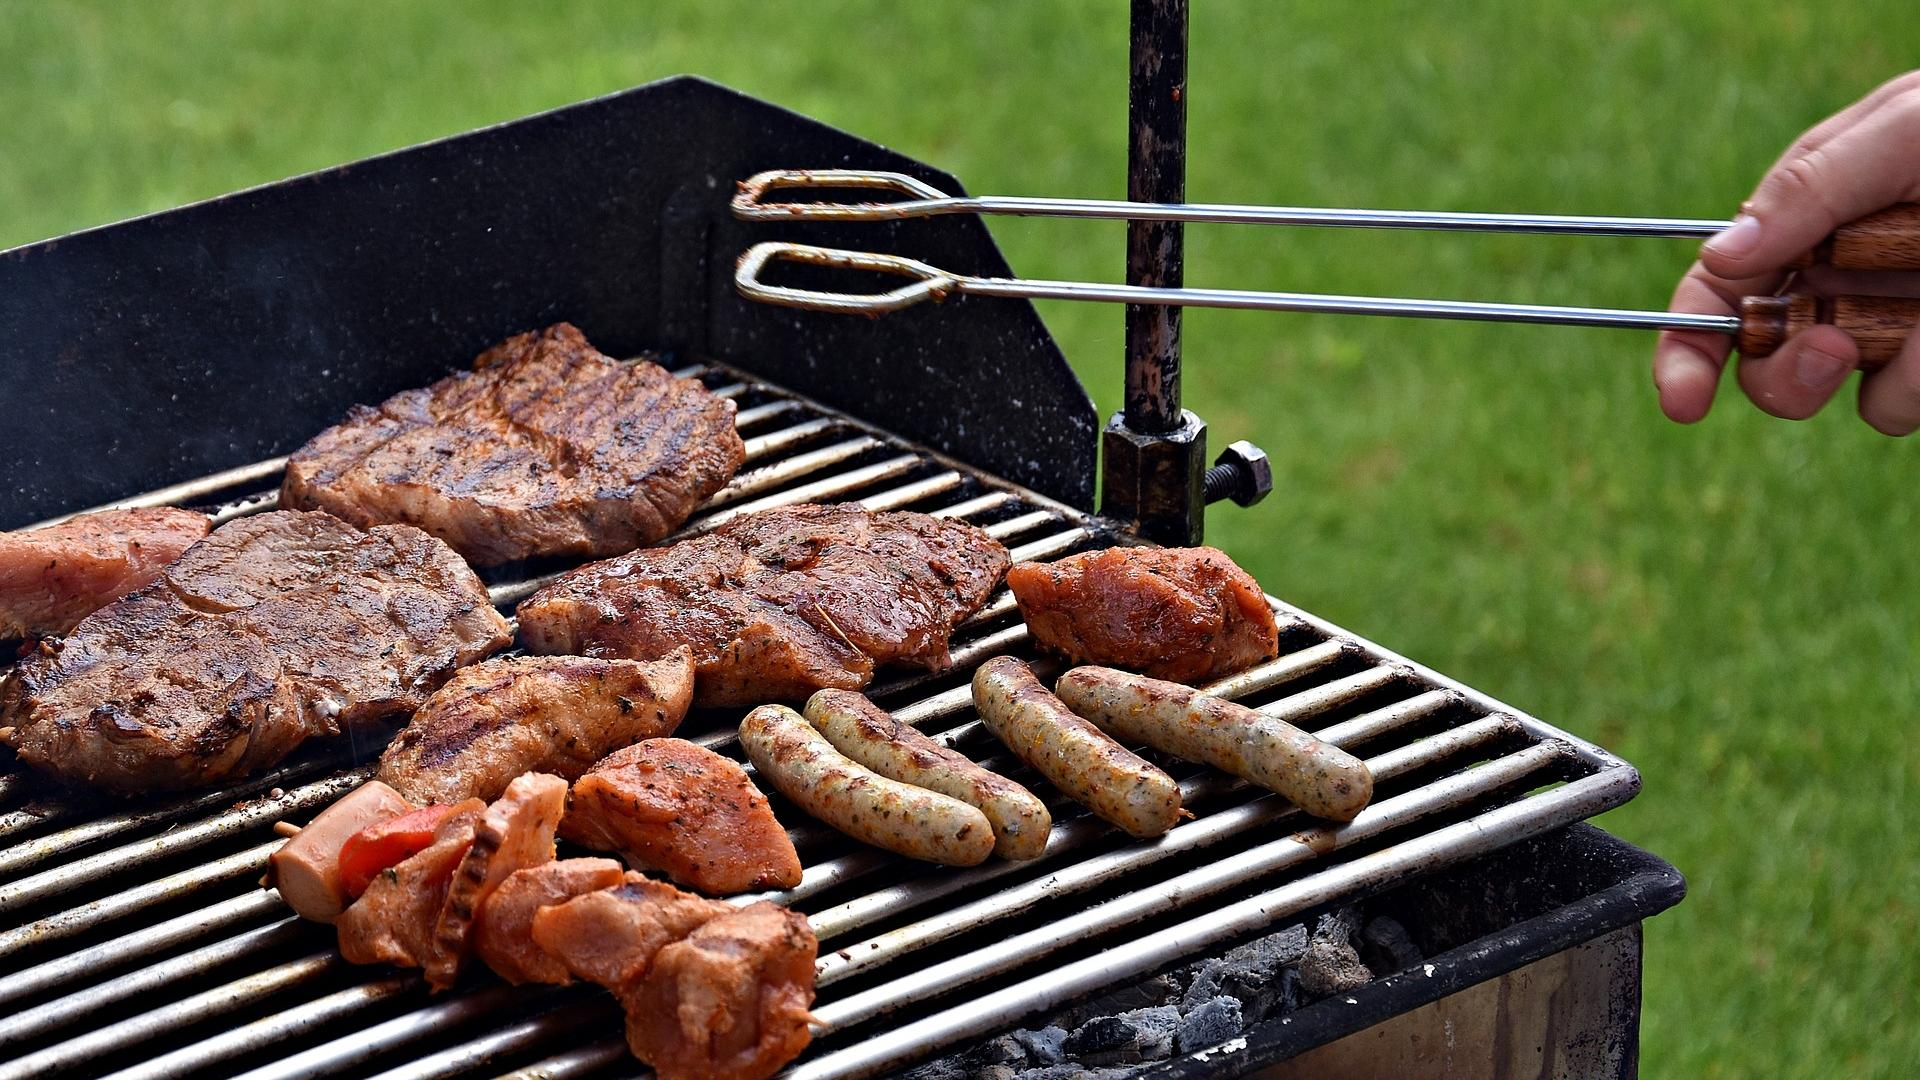 barbecue-3178916_1920.jpg